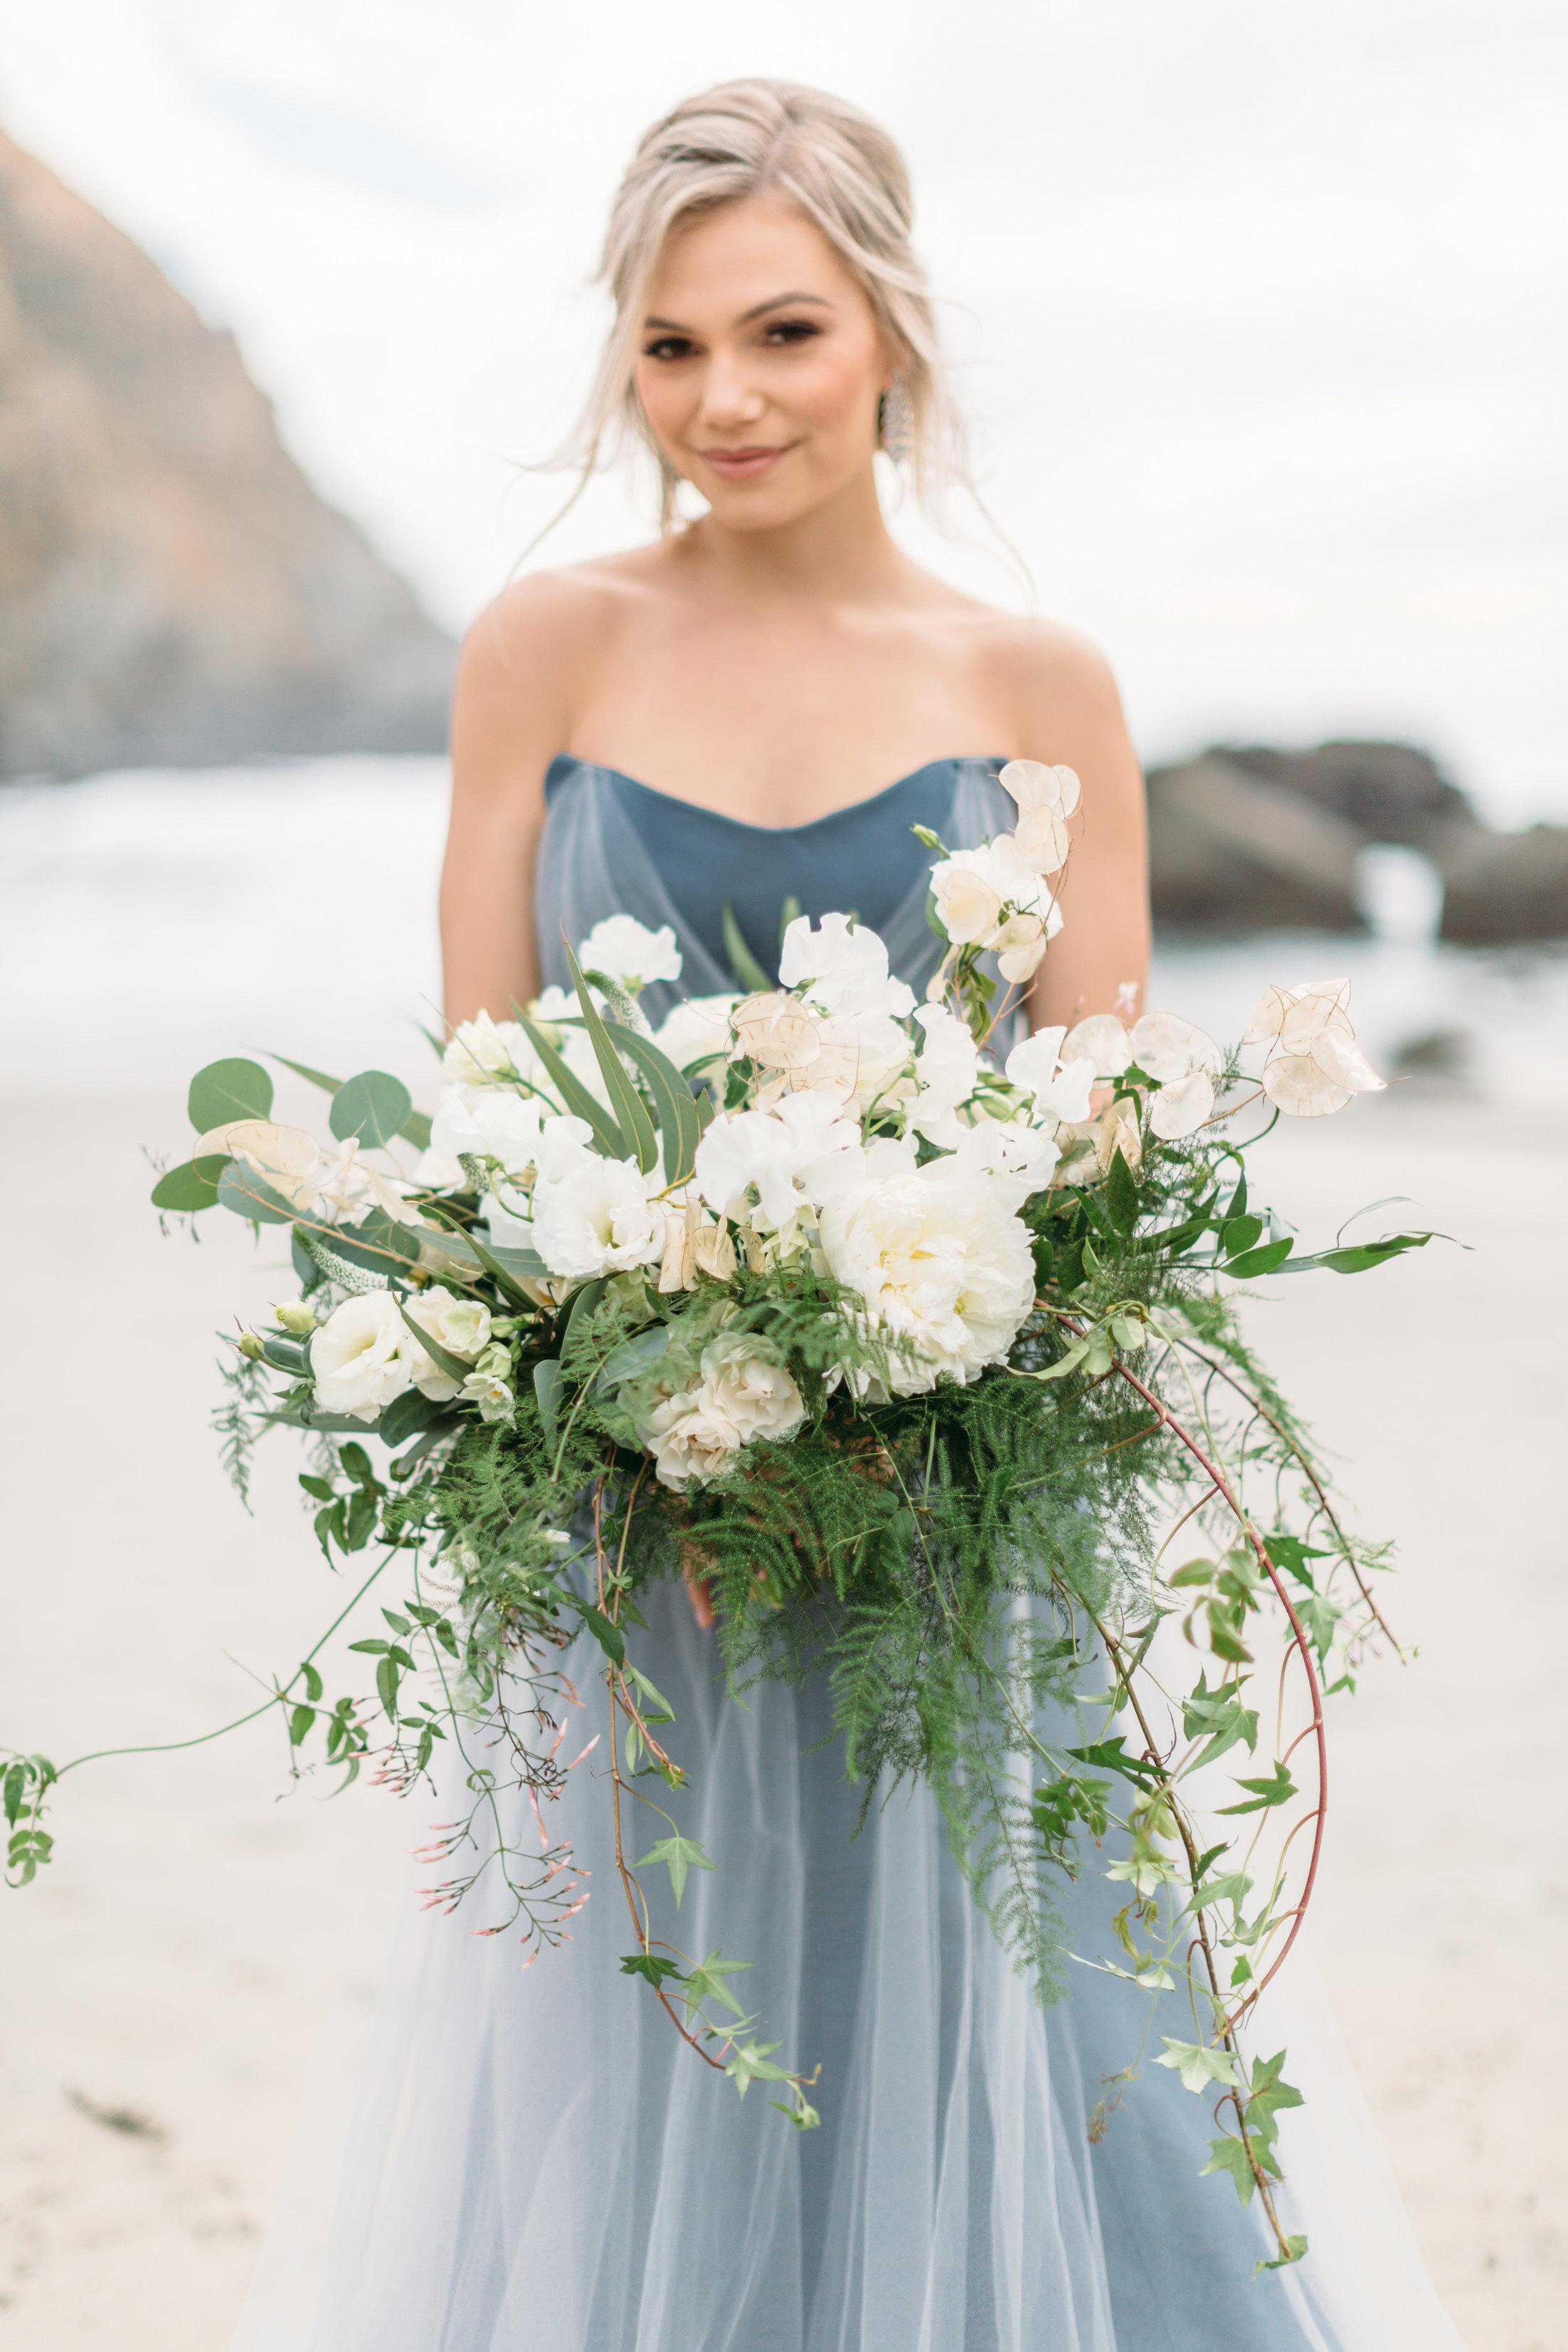 big-sur-wedding-tara-latour-19.jpg